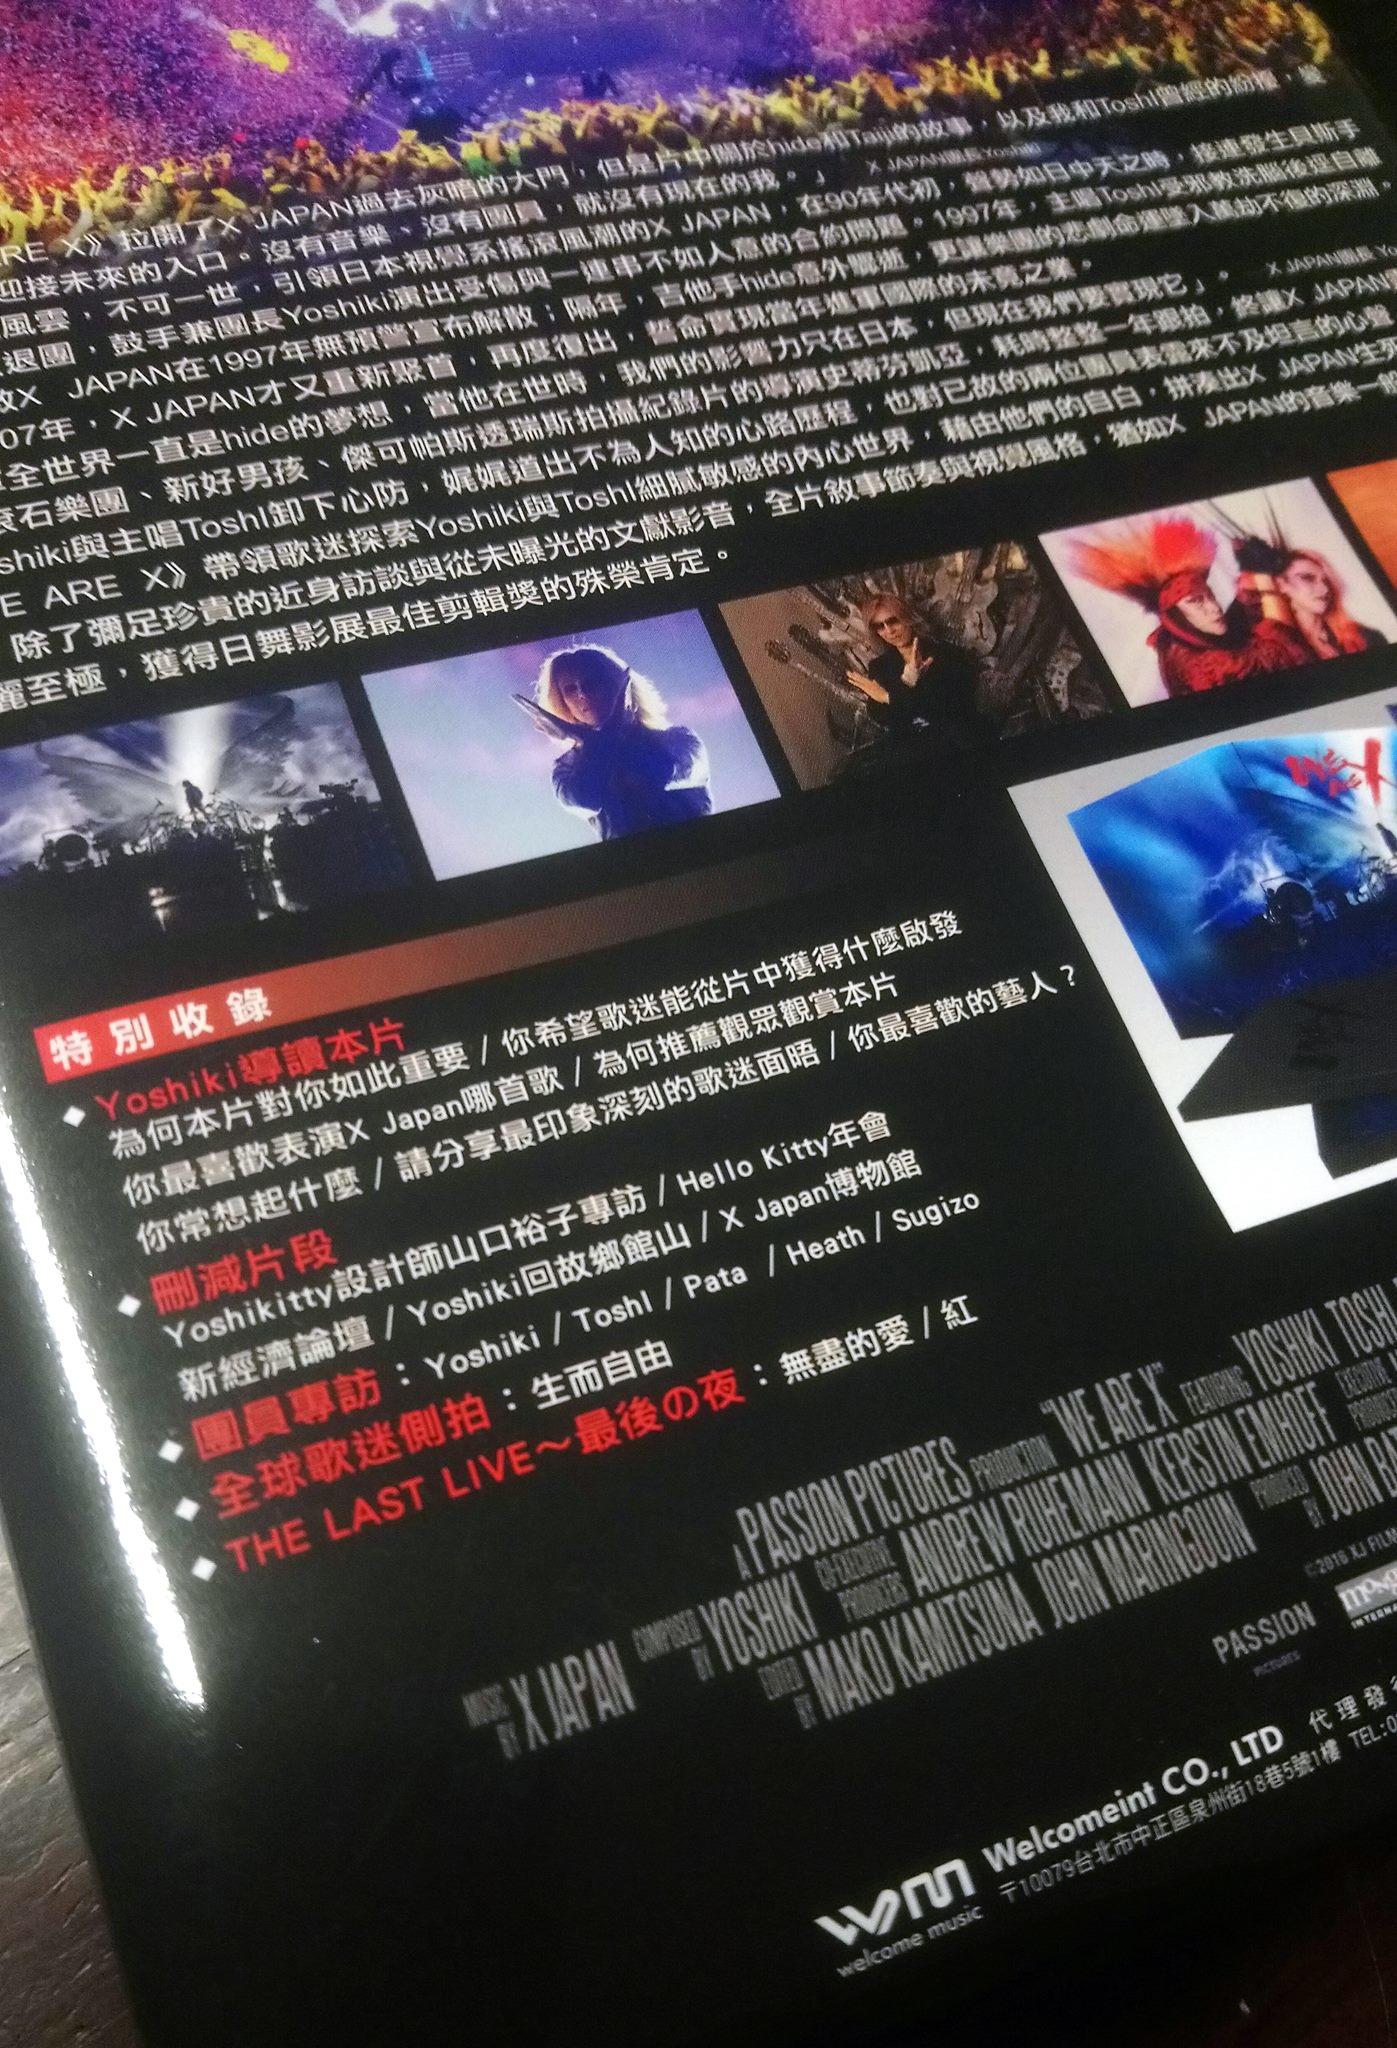 《WE ARE X:X JAPAN重生之路》雙碟BD